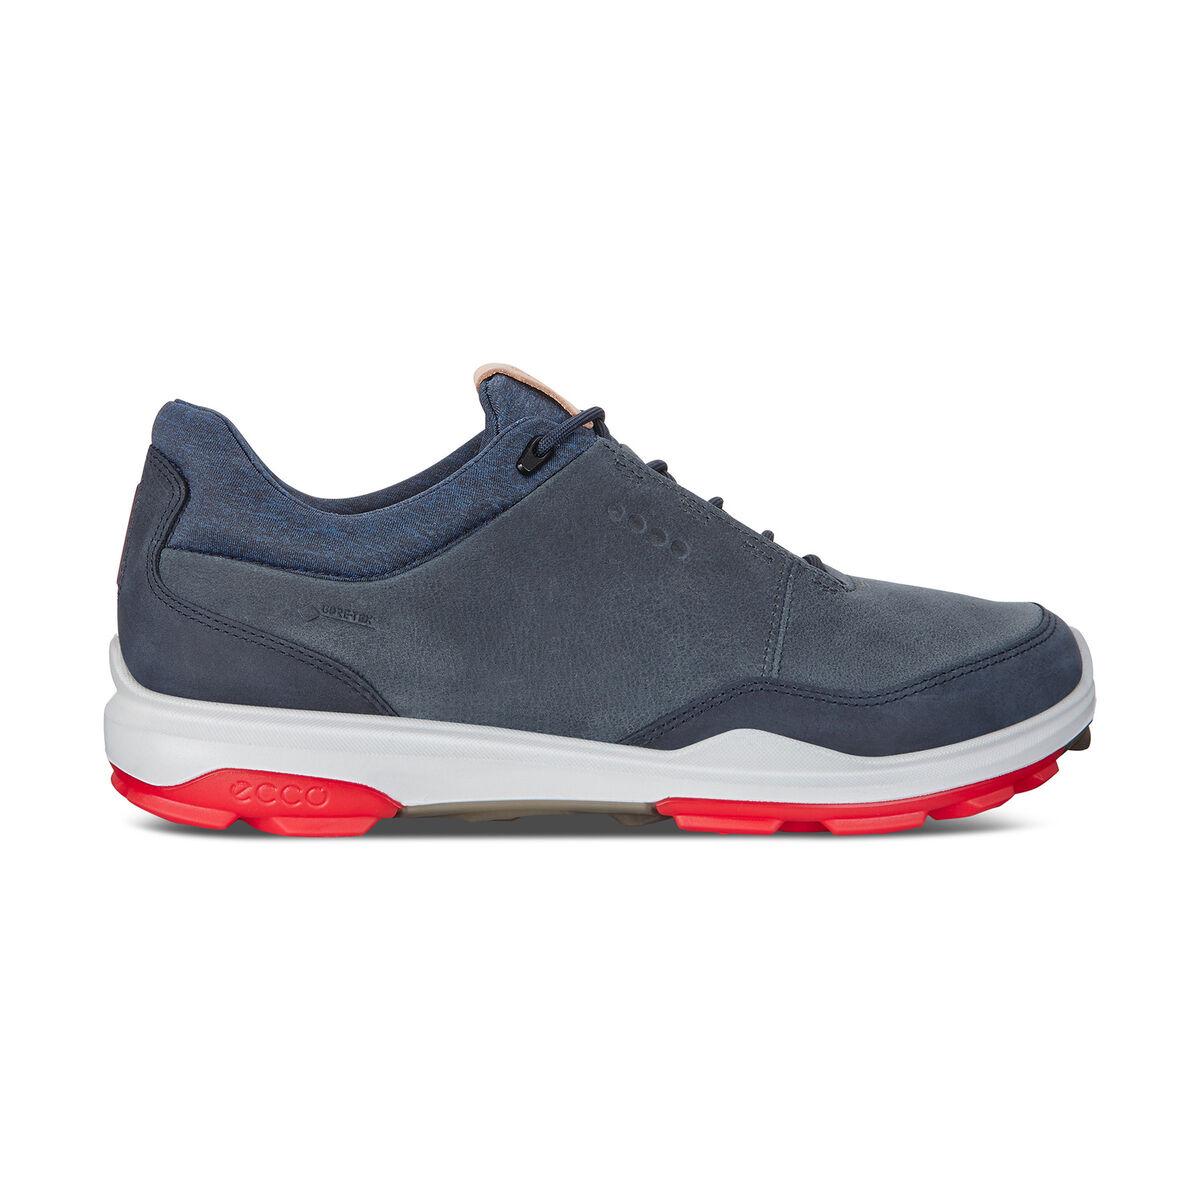 245721ee BIOM Hybrid 3 GTX Men's Golf Shoe - Navy/Red